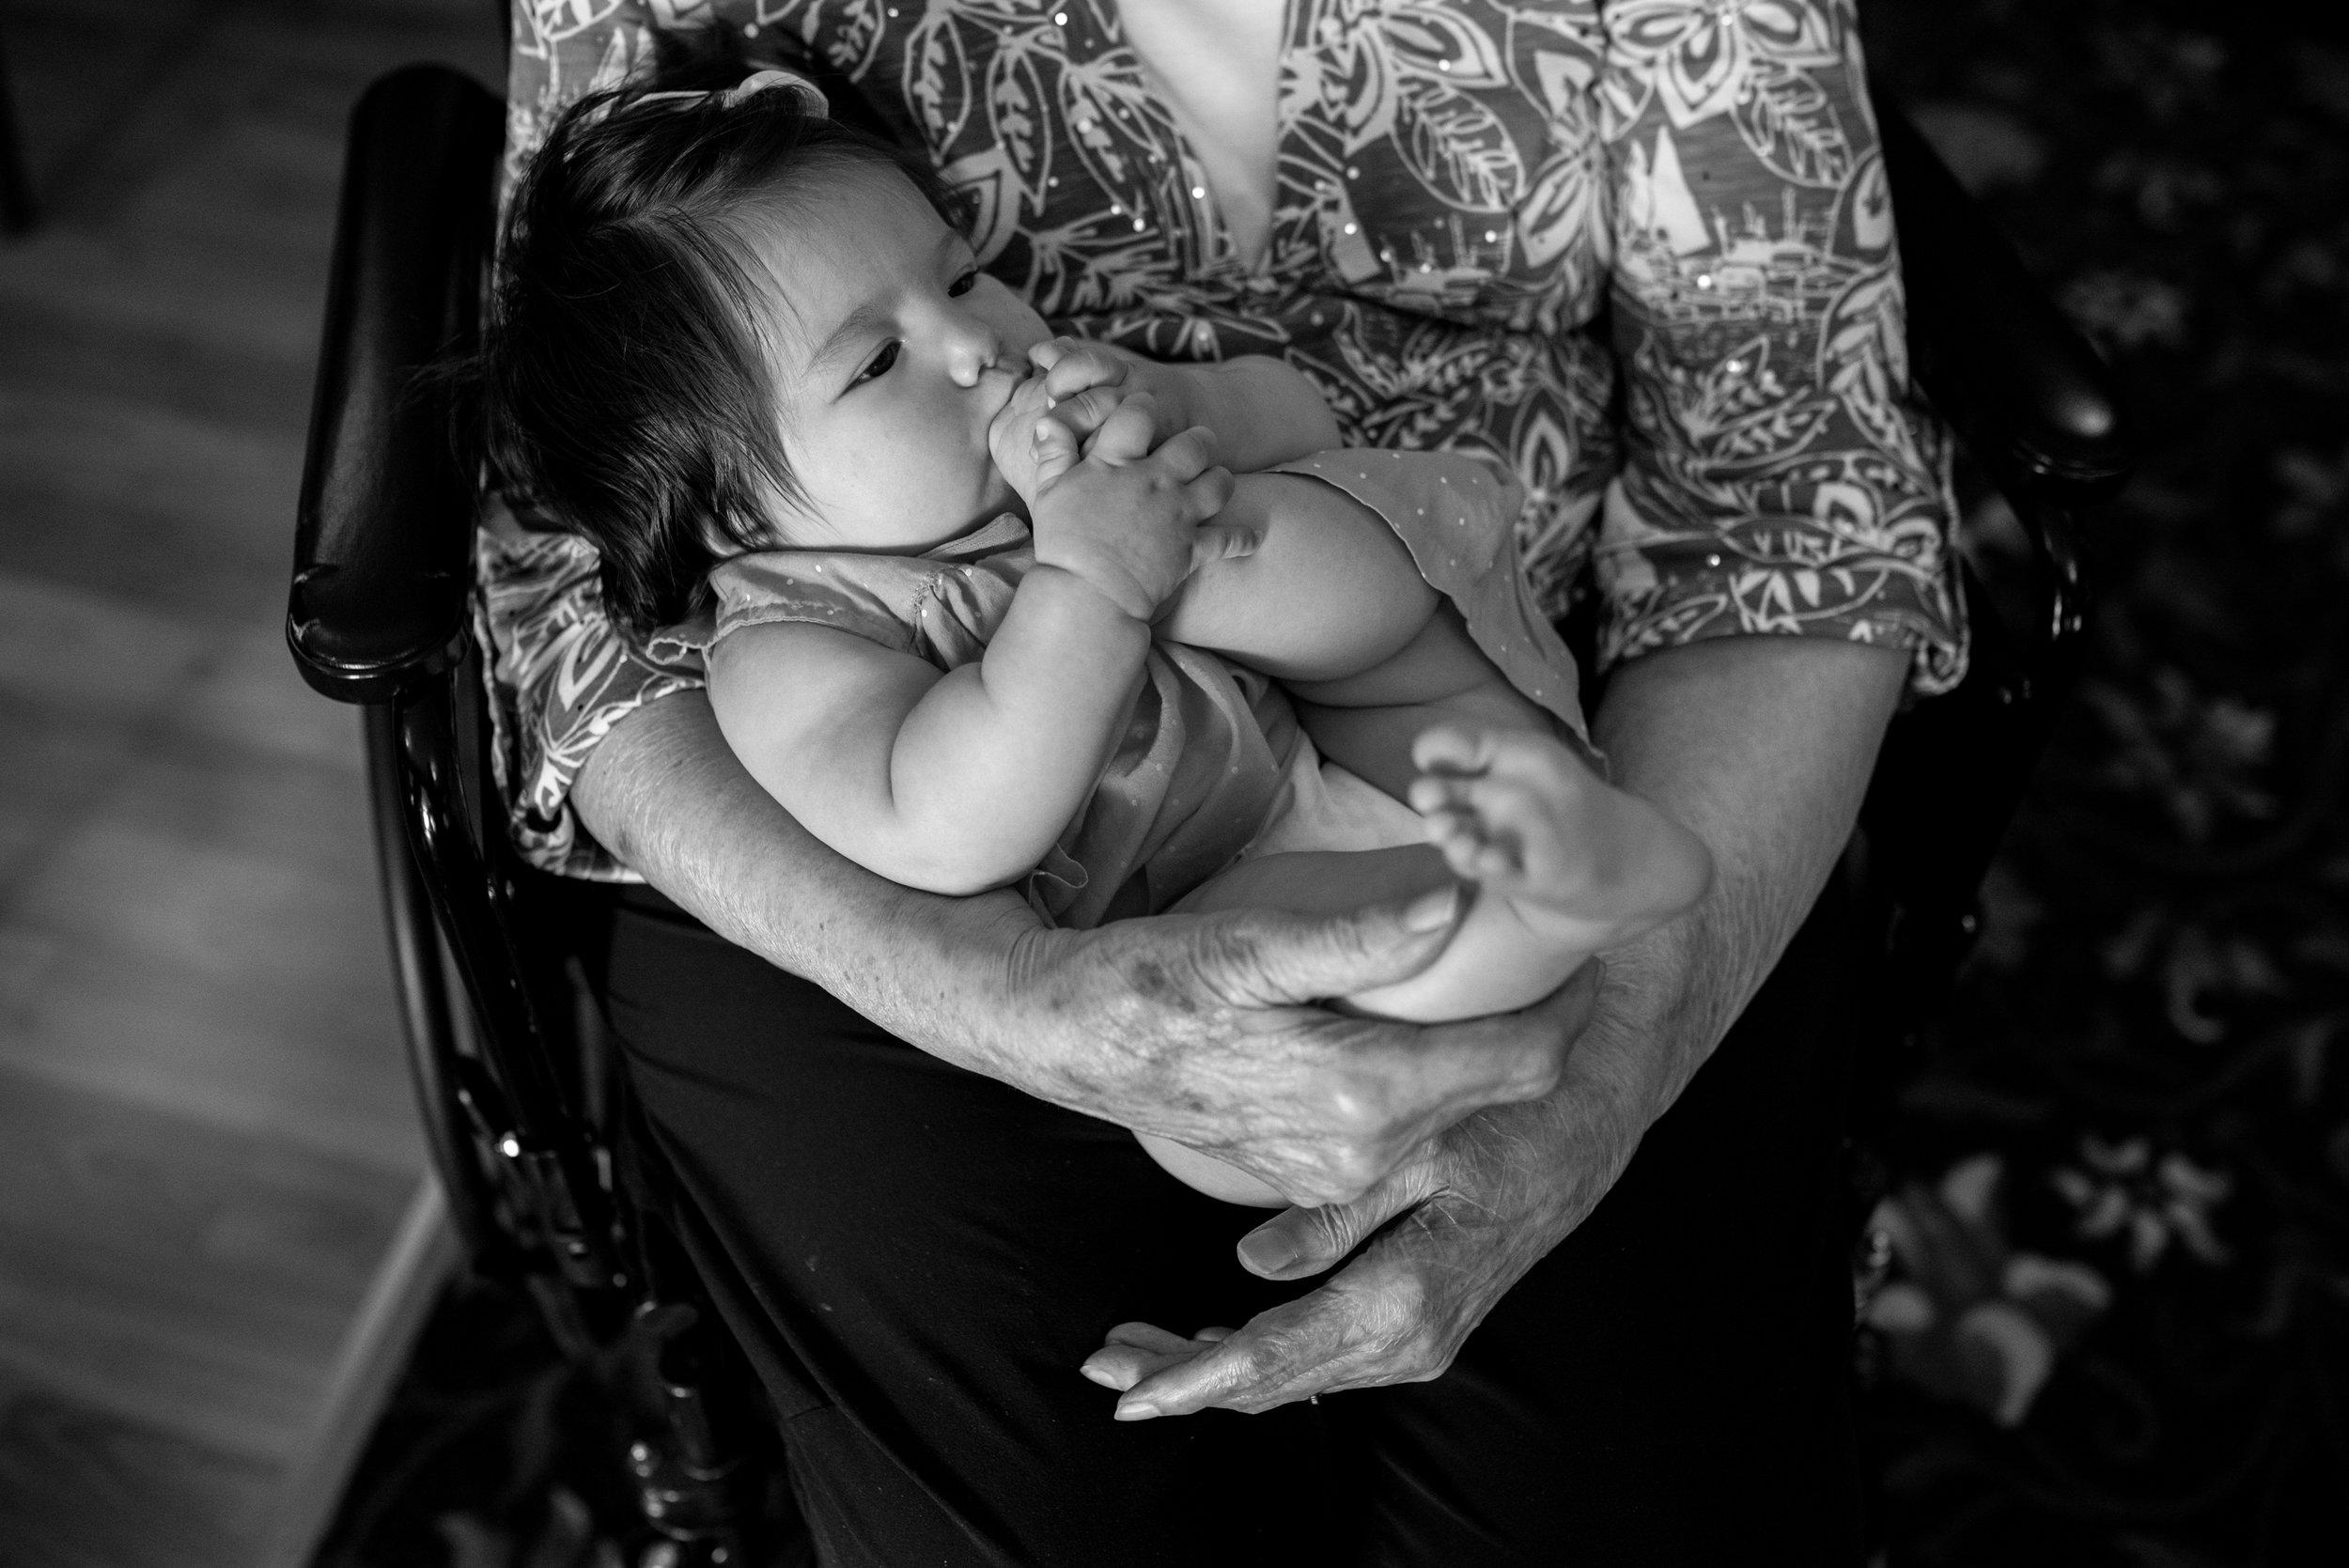 Kari Gierach Photography, Milwaukee Wisconsin documentary family photographer, Hales Corners family photography, baby girl and grandma, great grandma -1.jpg